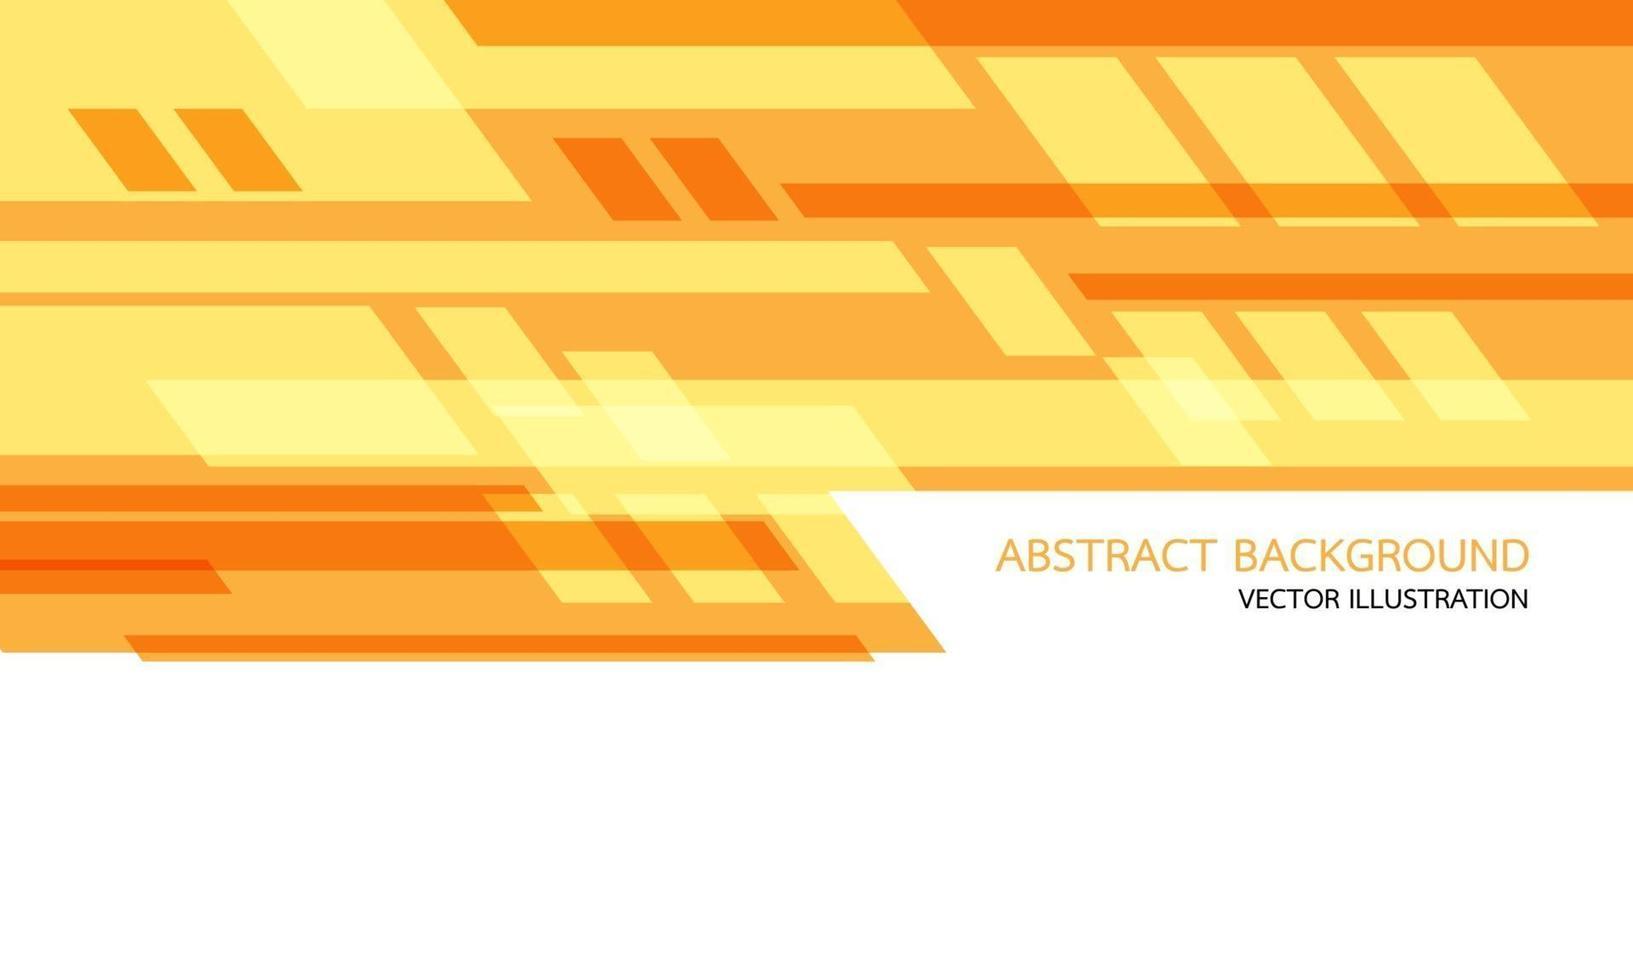 abstrakt gul orange geometrisk hastighetsteknik på vitt med tomt utrymme och textdesign modern futuristisk bakgrundsvektorillustration. vektor